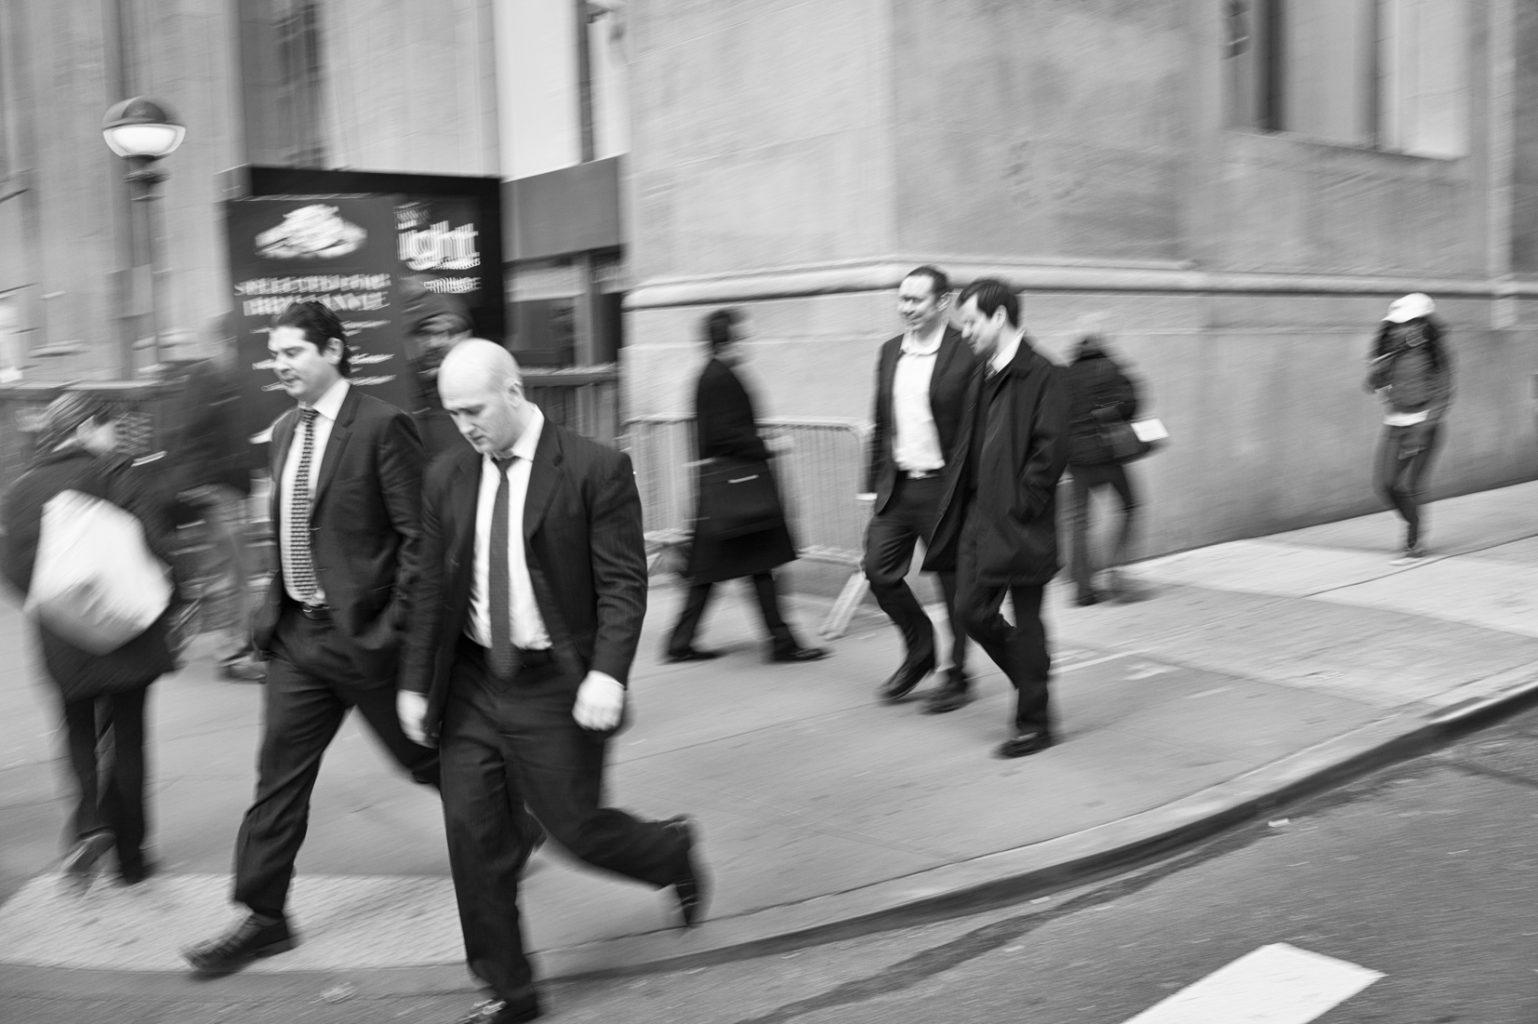 Wall Street, New York City, 3. Februar 2012